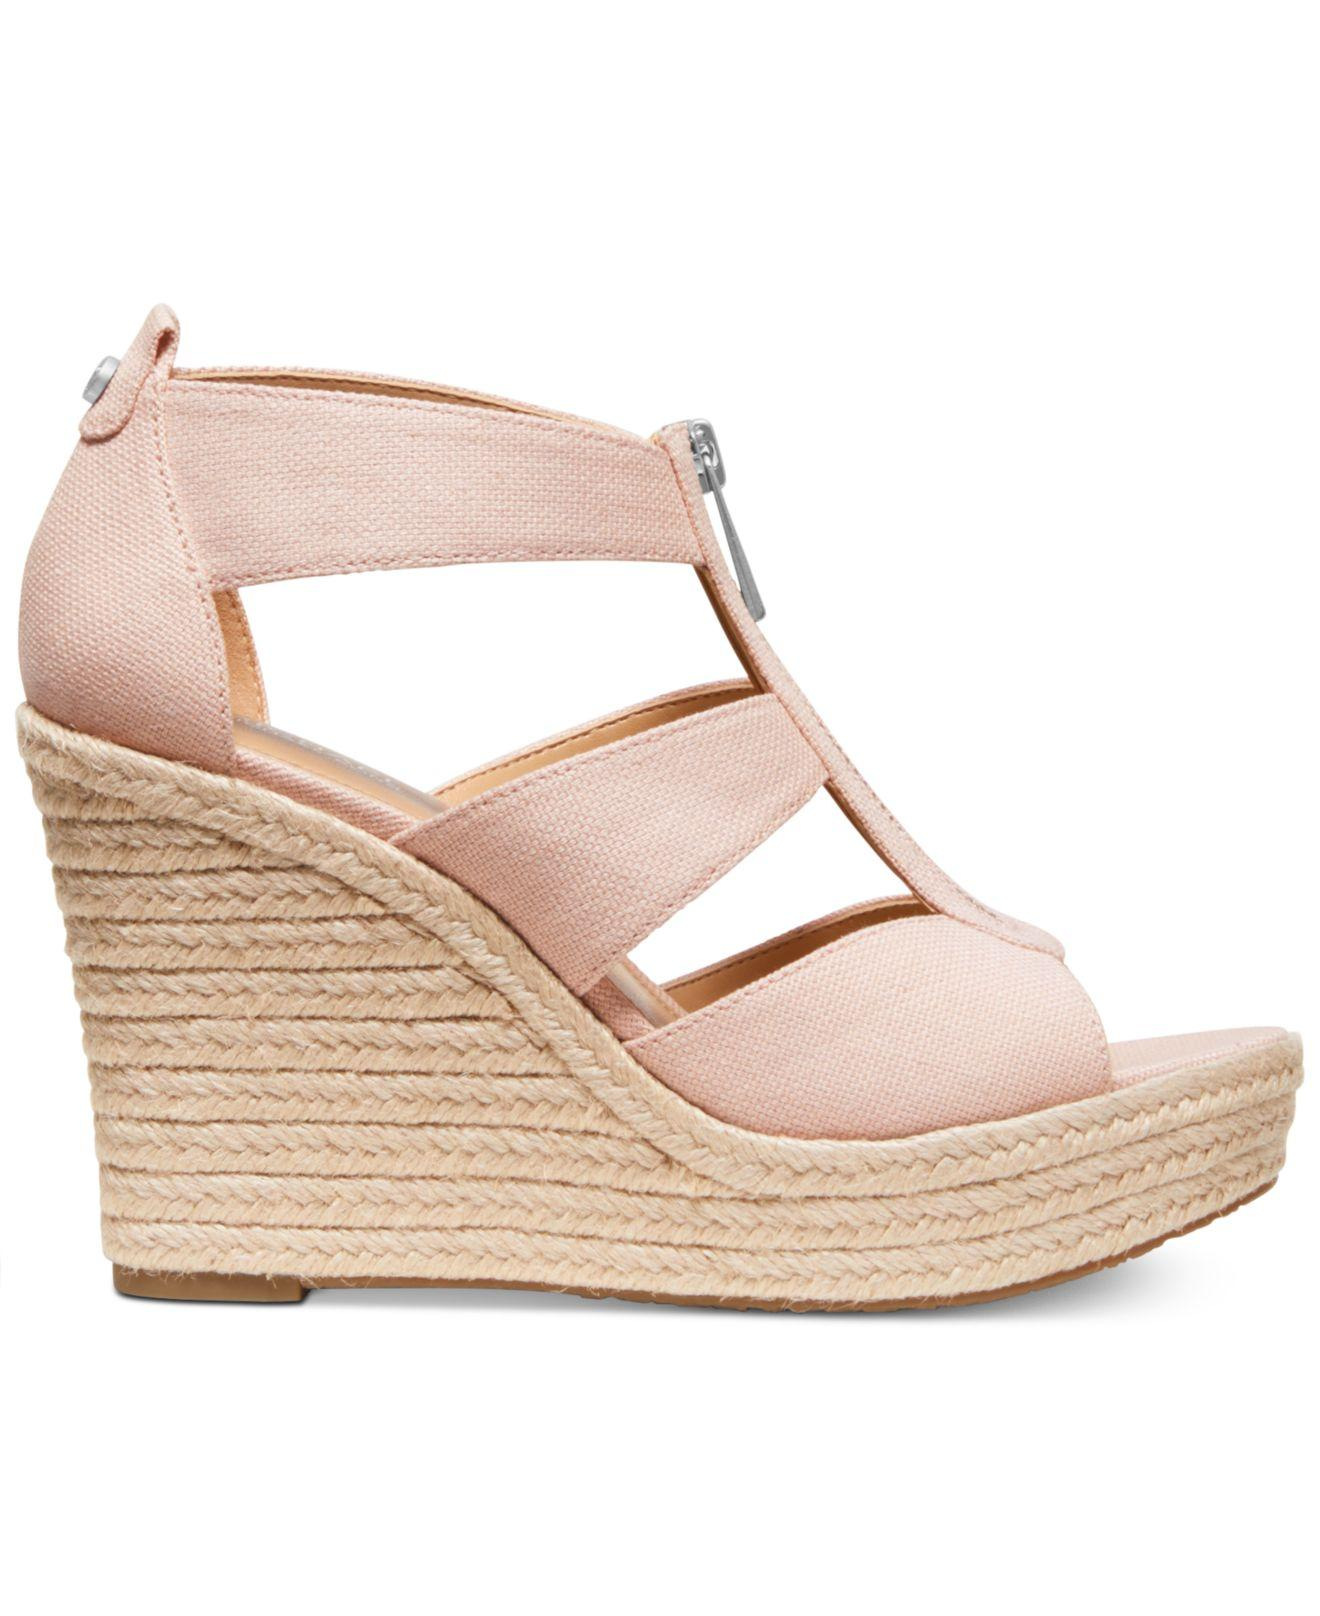 44db805b96c Michael Kors Michael Damita Platform Wedge Sandals in Pink - Save 56% - Lyst